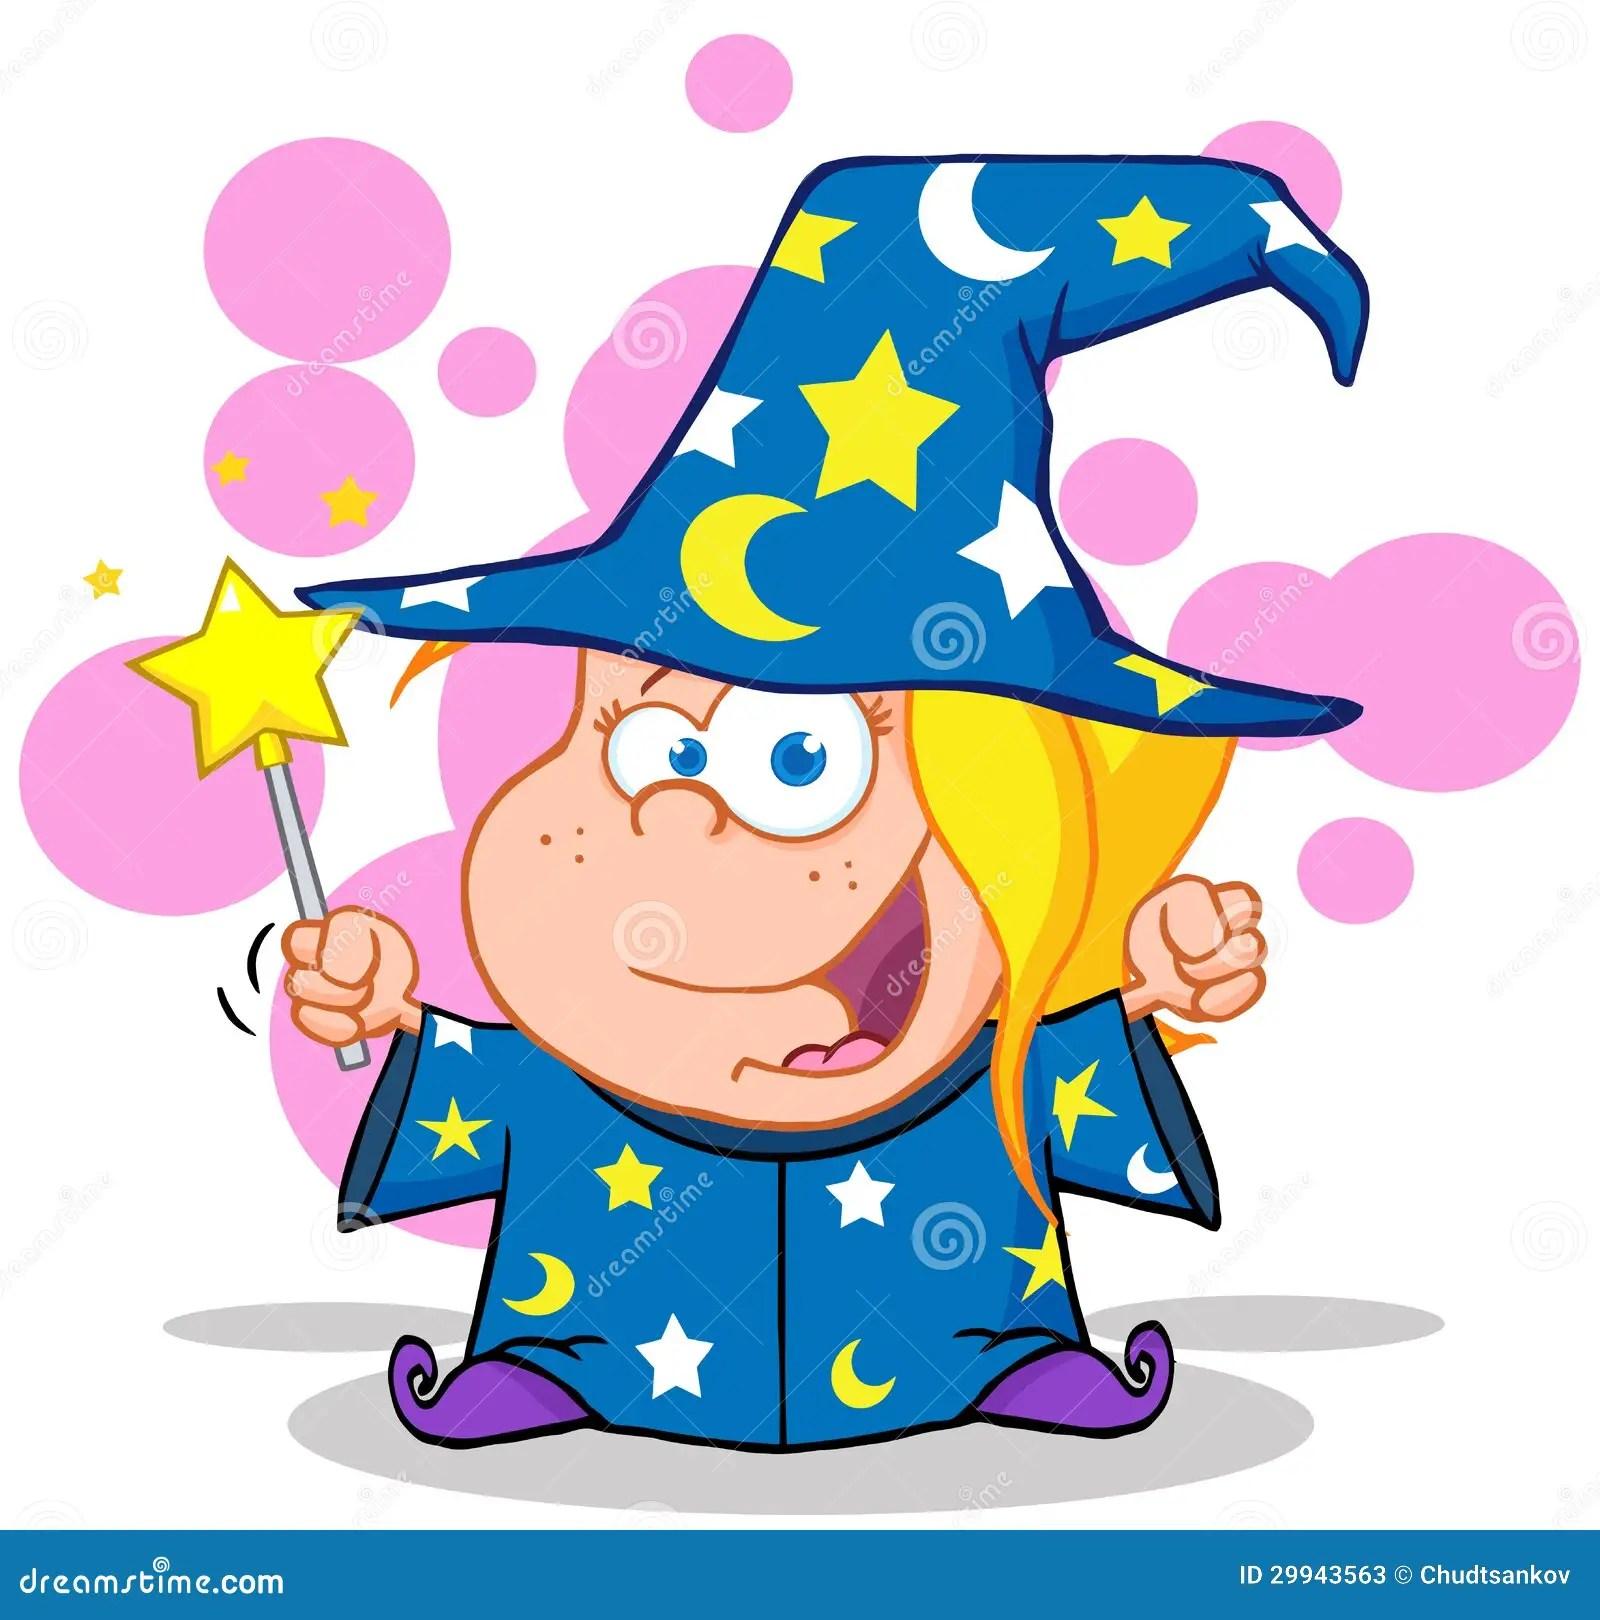 Happy Wizard Girl Waving With Magic Wand Stock Photos